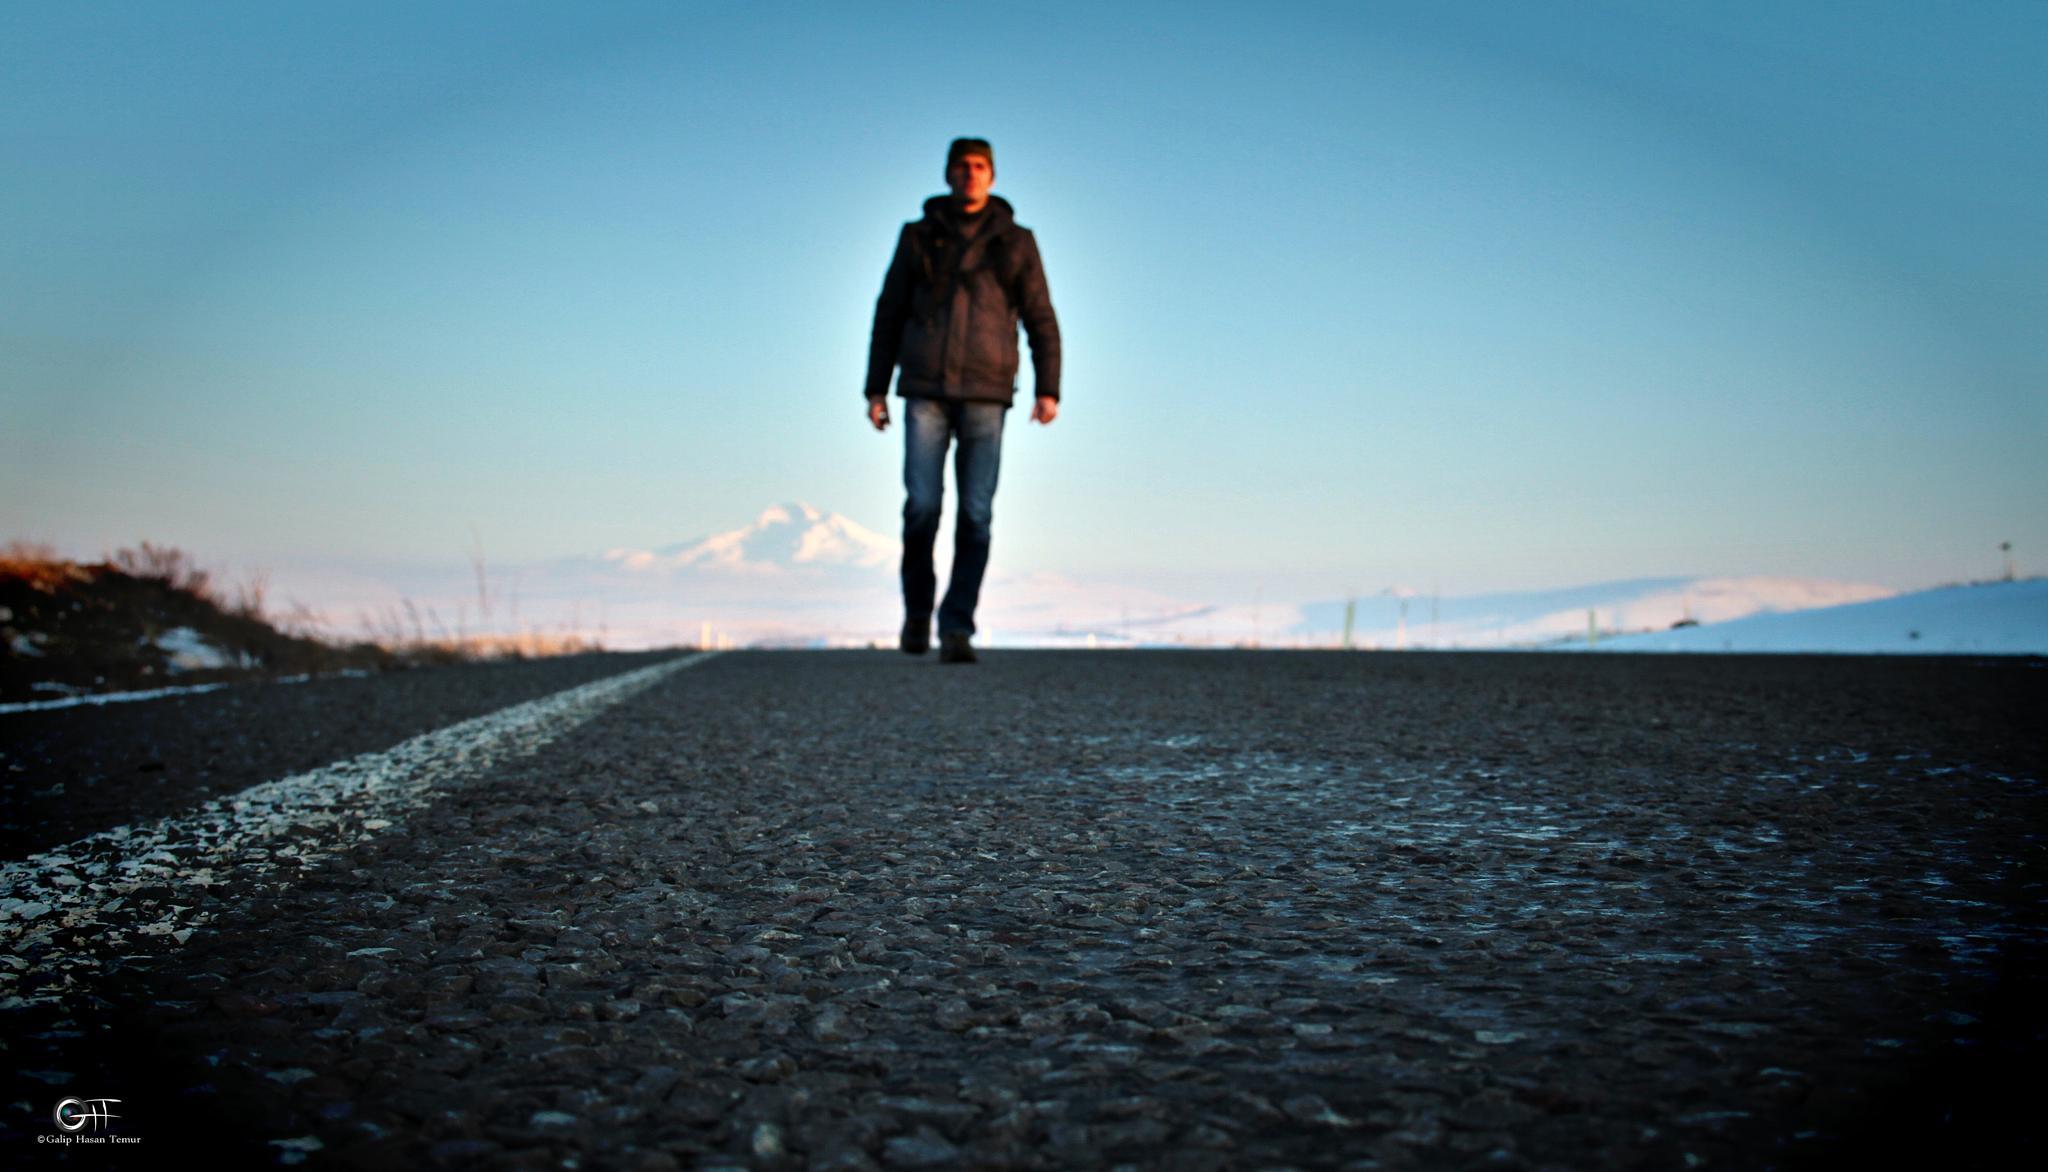 my way by Galip Hasan Temur